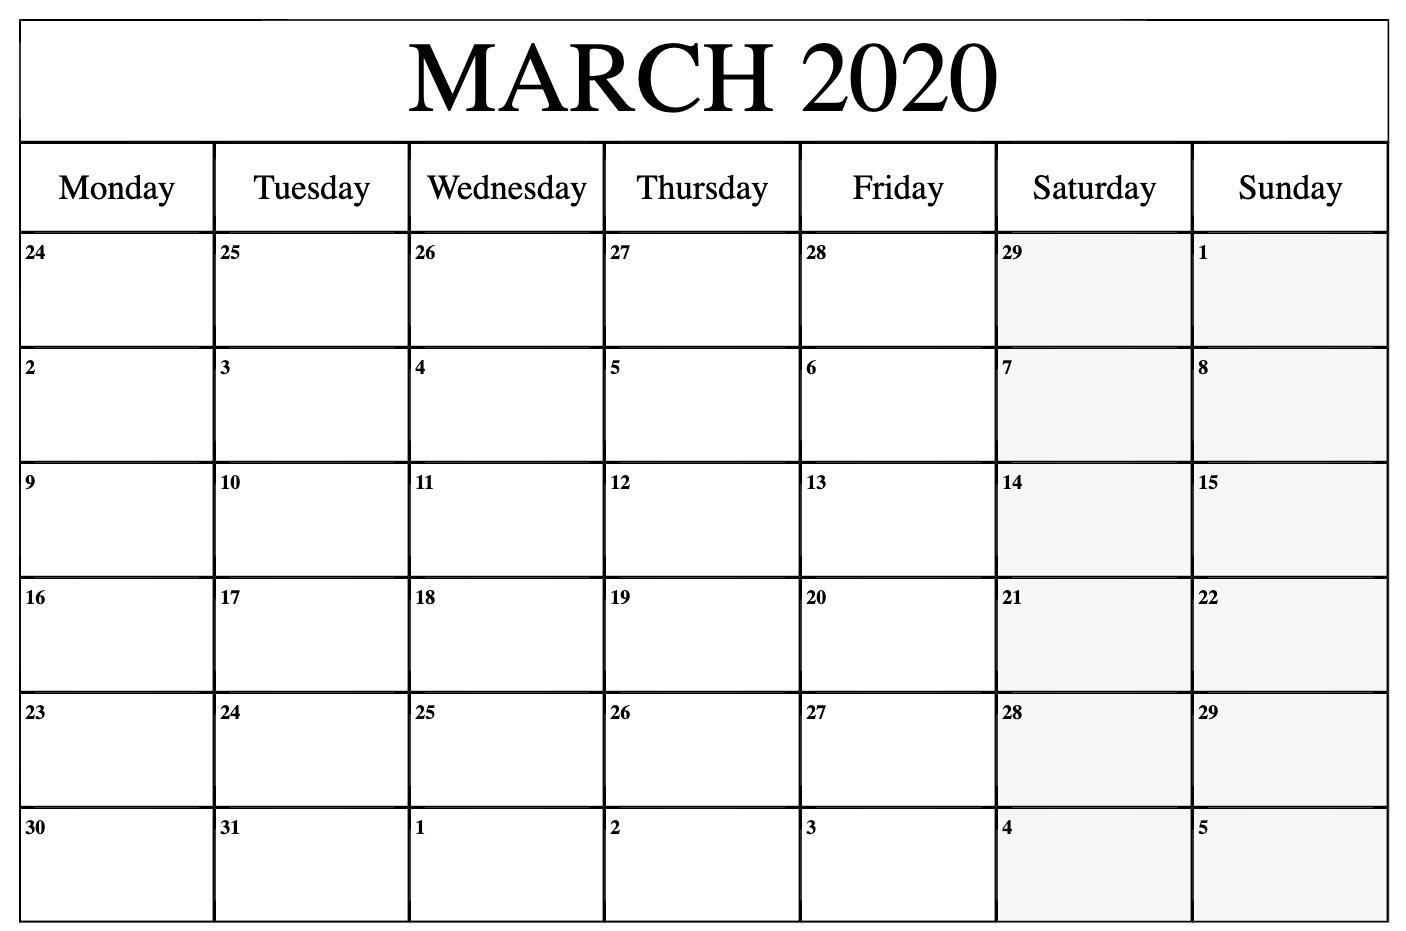 March 2020 Calendar PDF